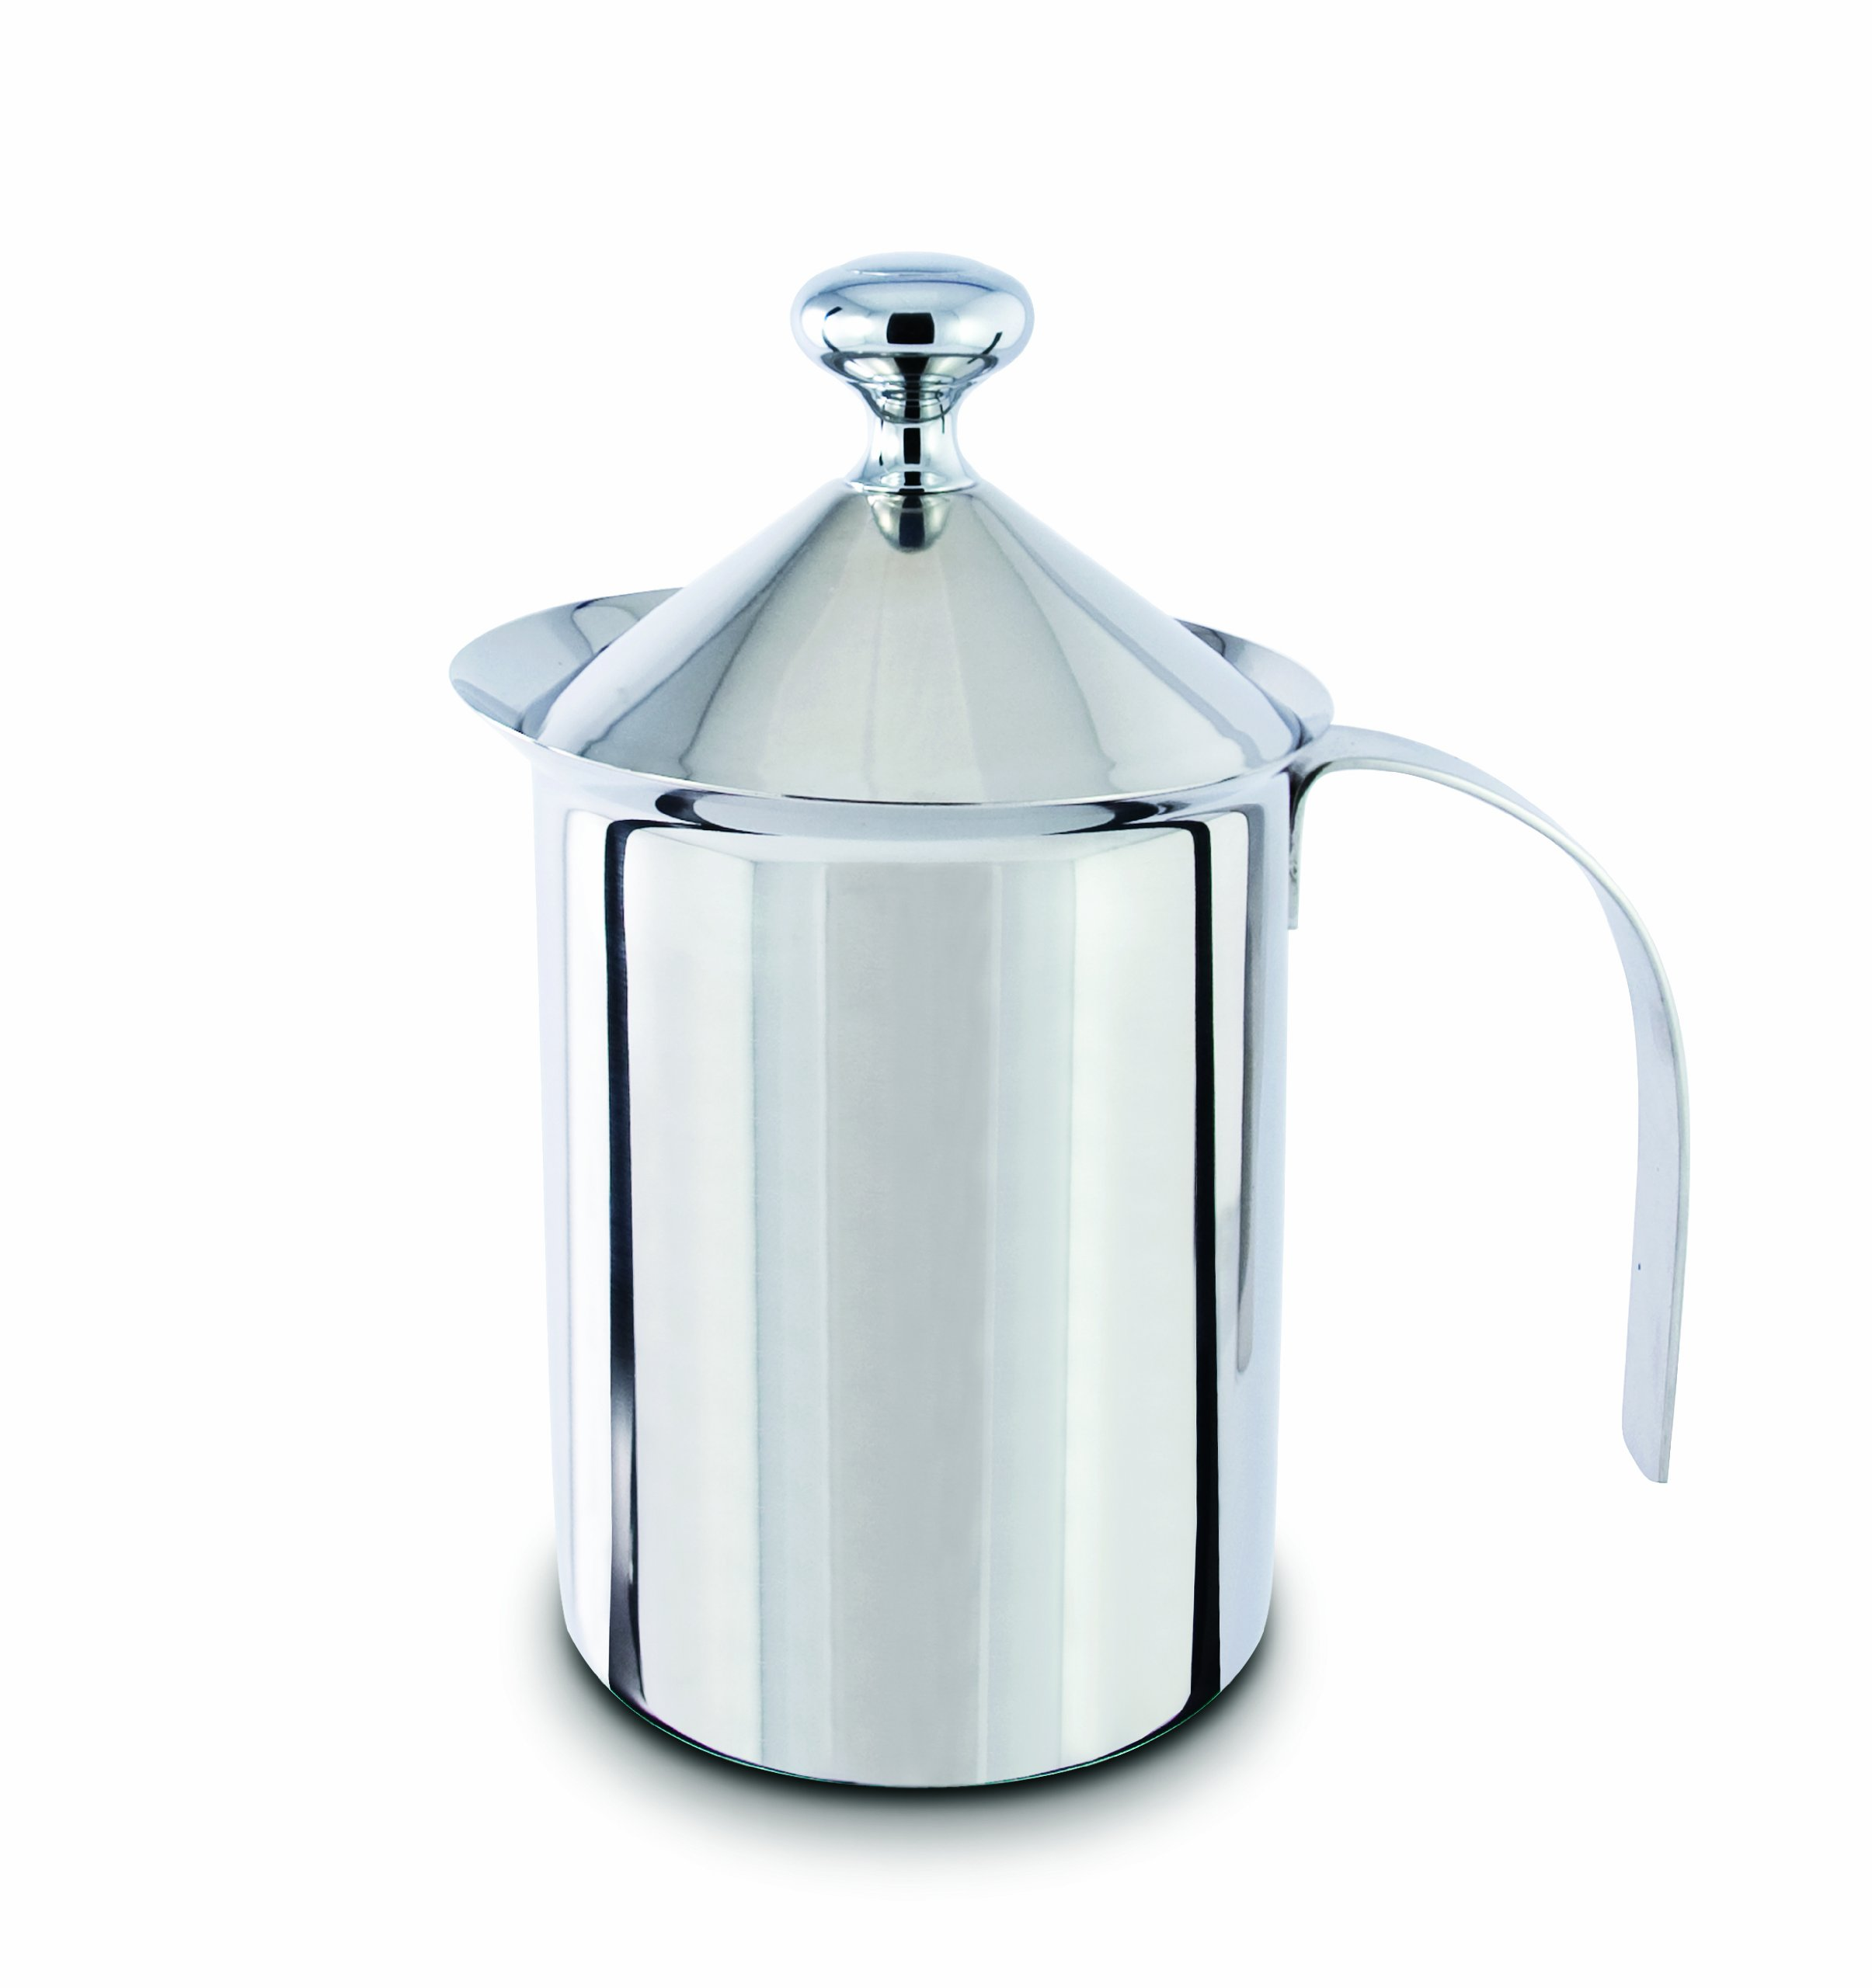 Cuisinox 500ml Hand Pump Cappuccino/Milk Frother